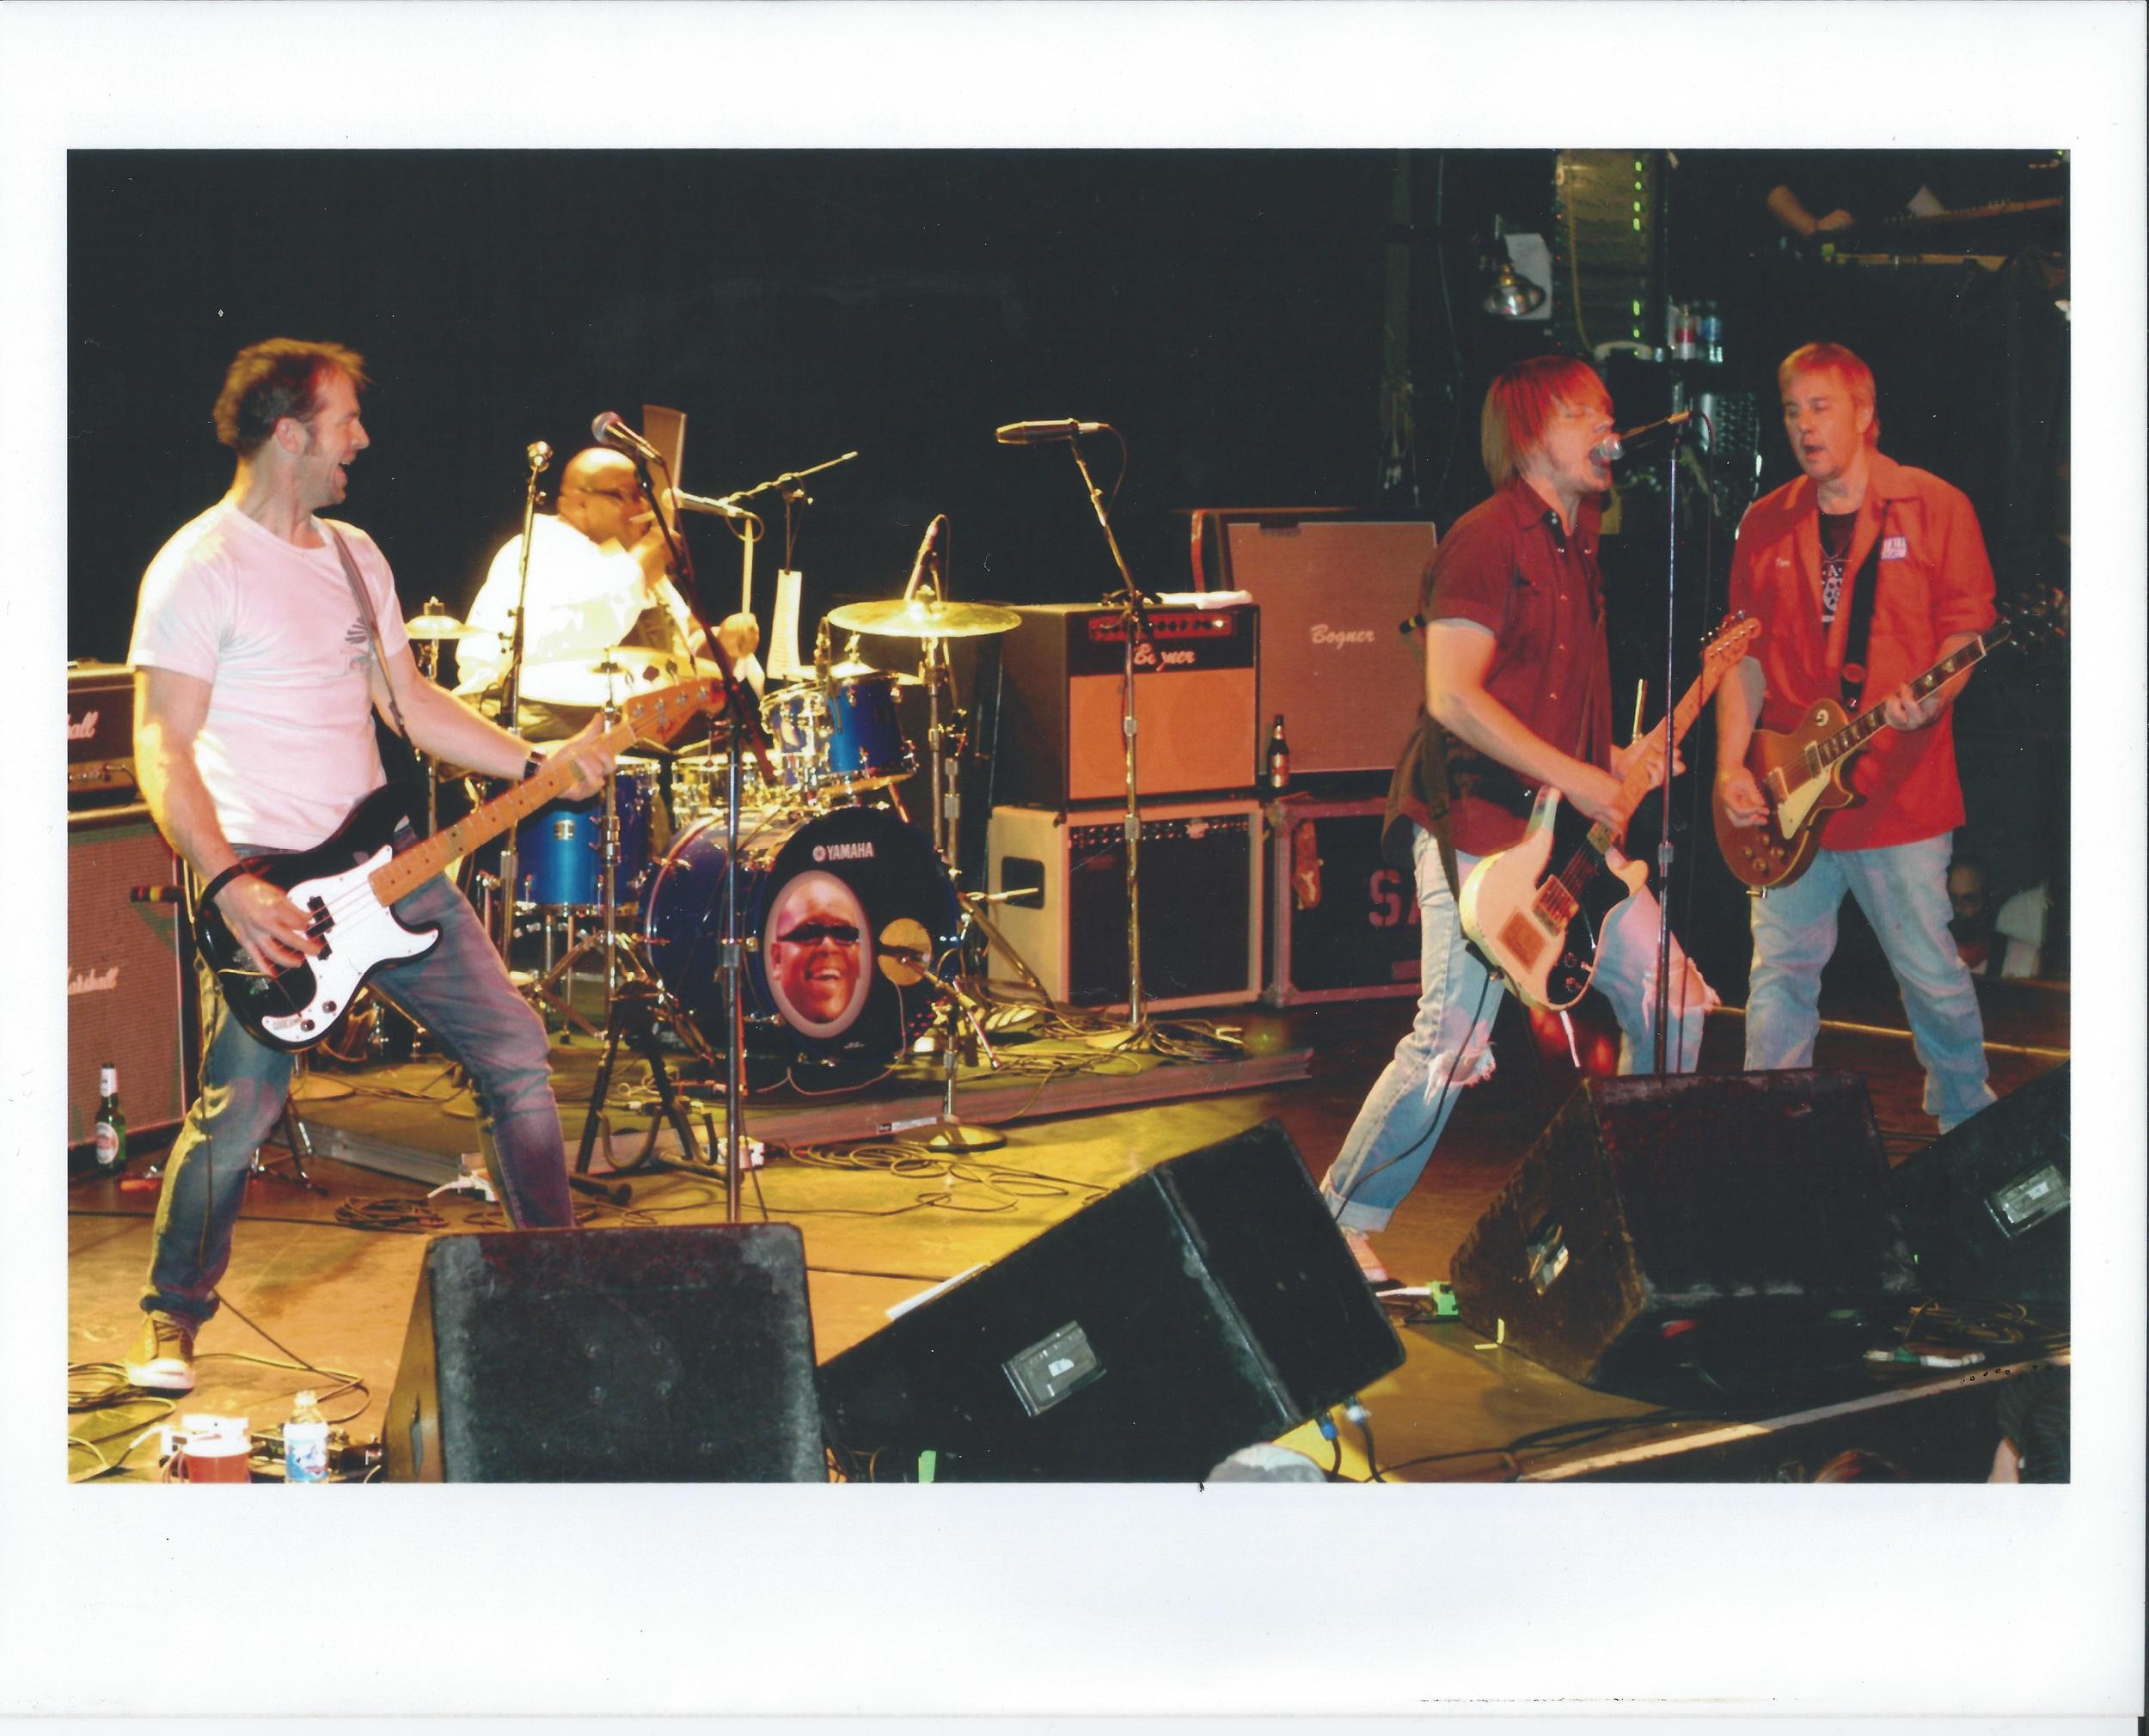 SA_1stAve2007.jpg